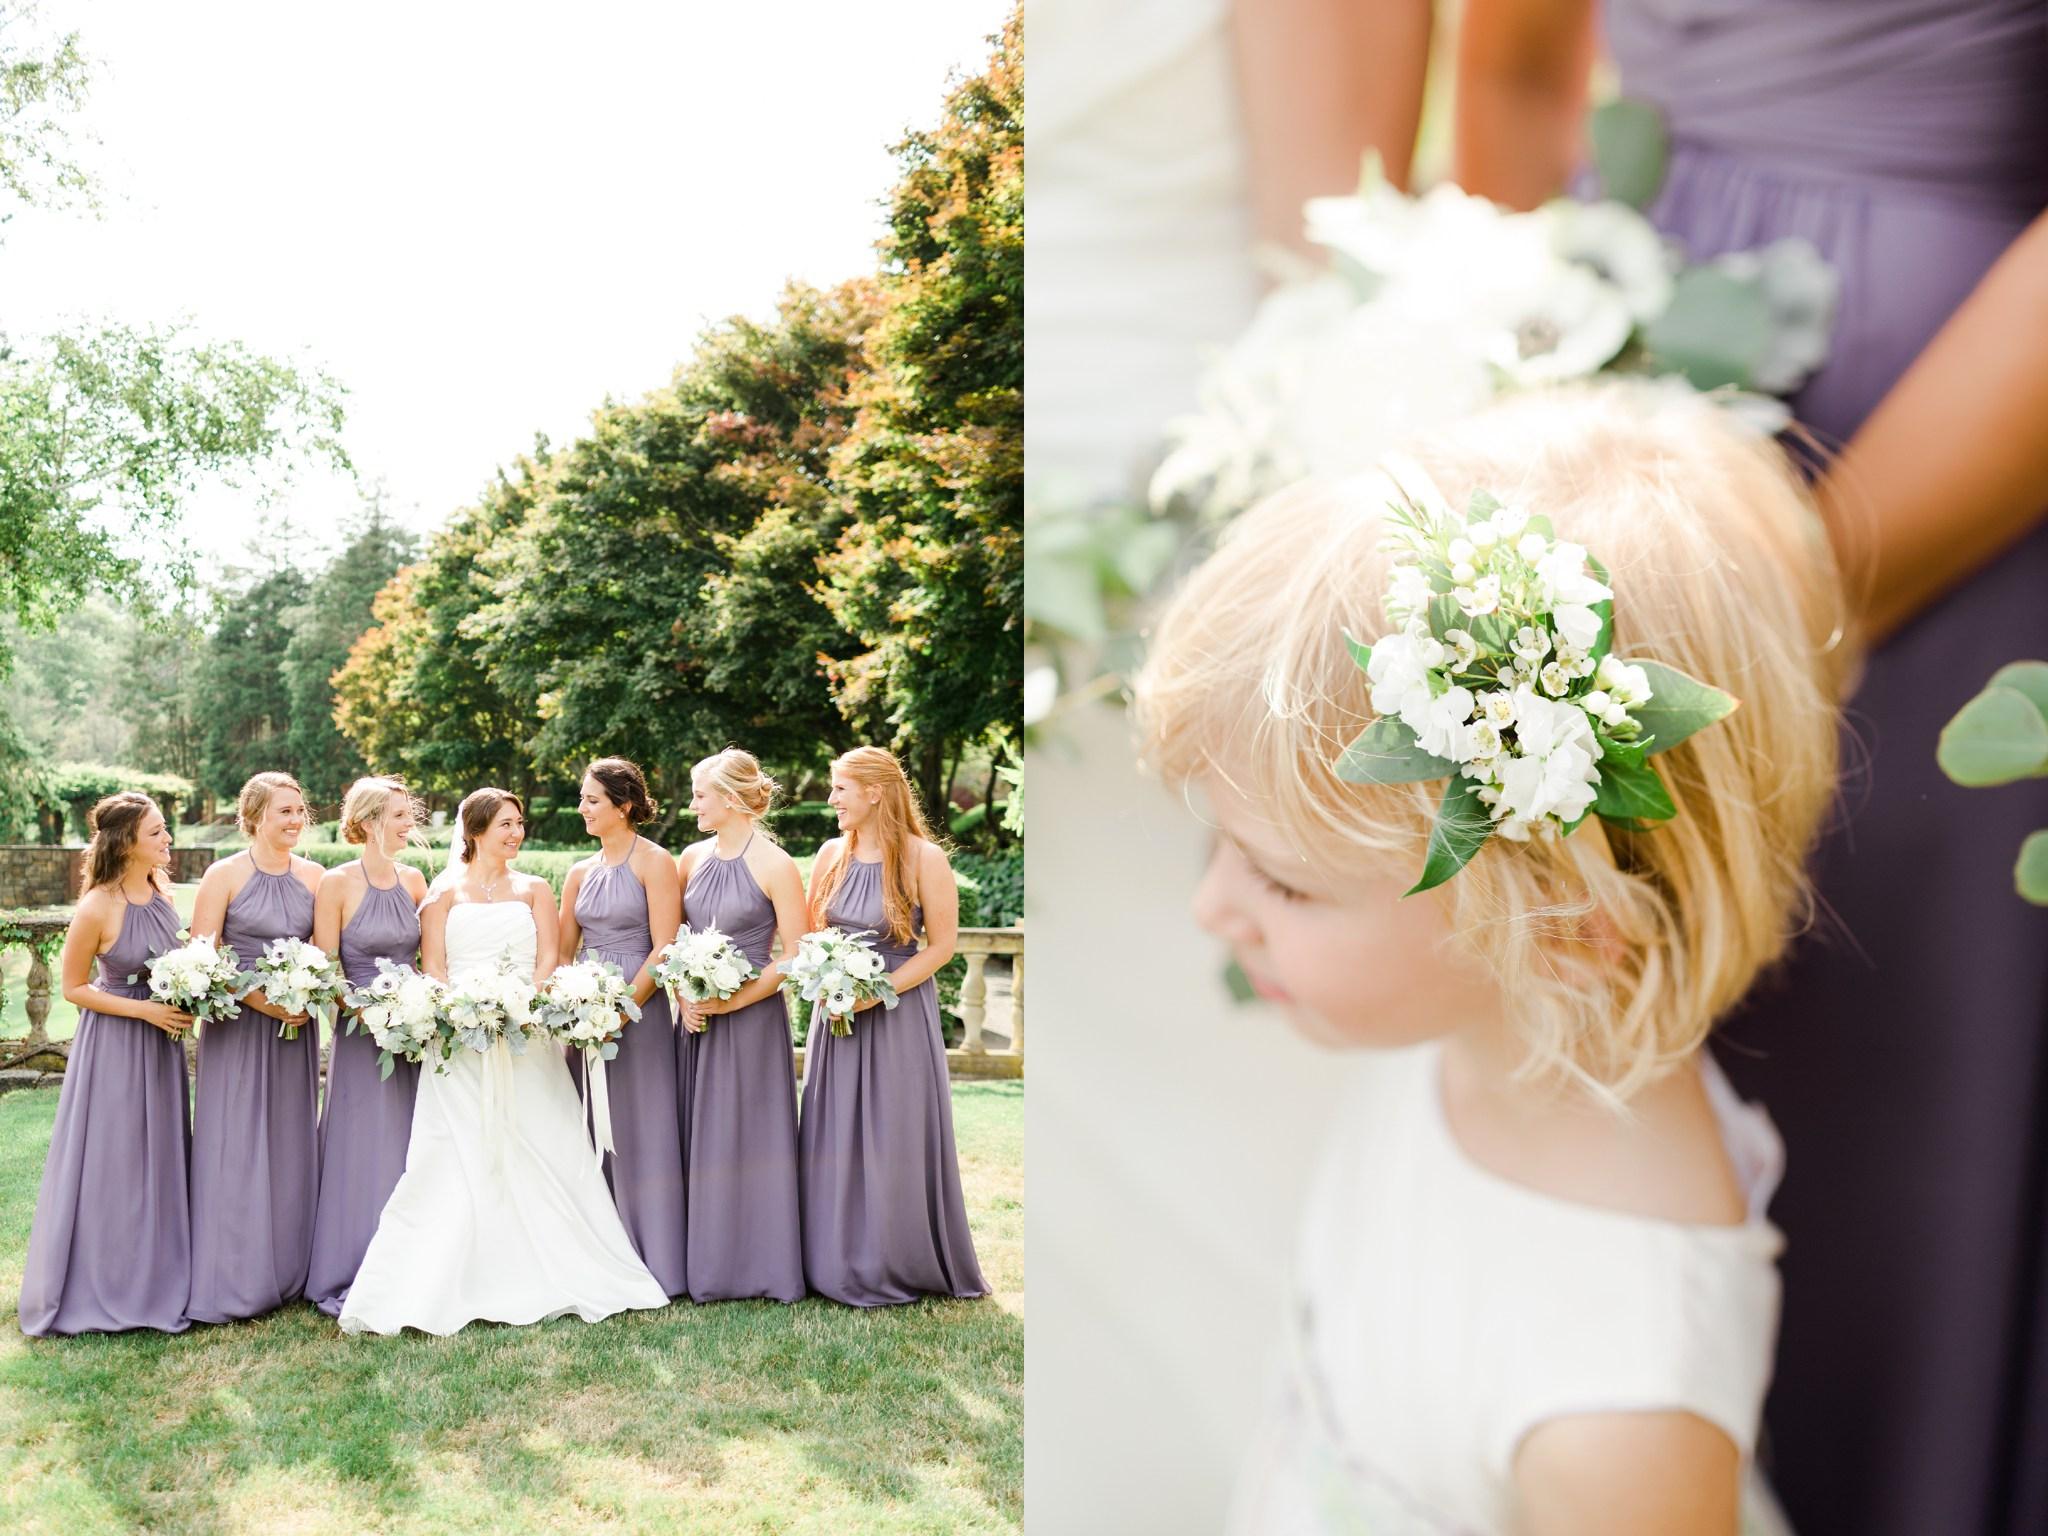 turner_hill_wedding_photos_00027.JPG